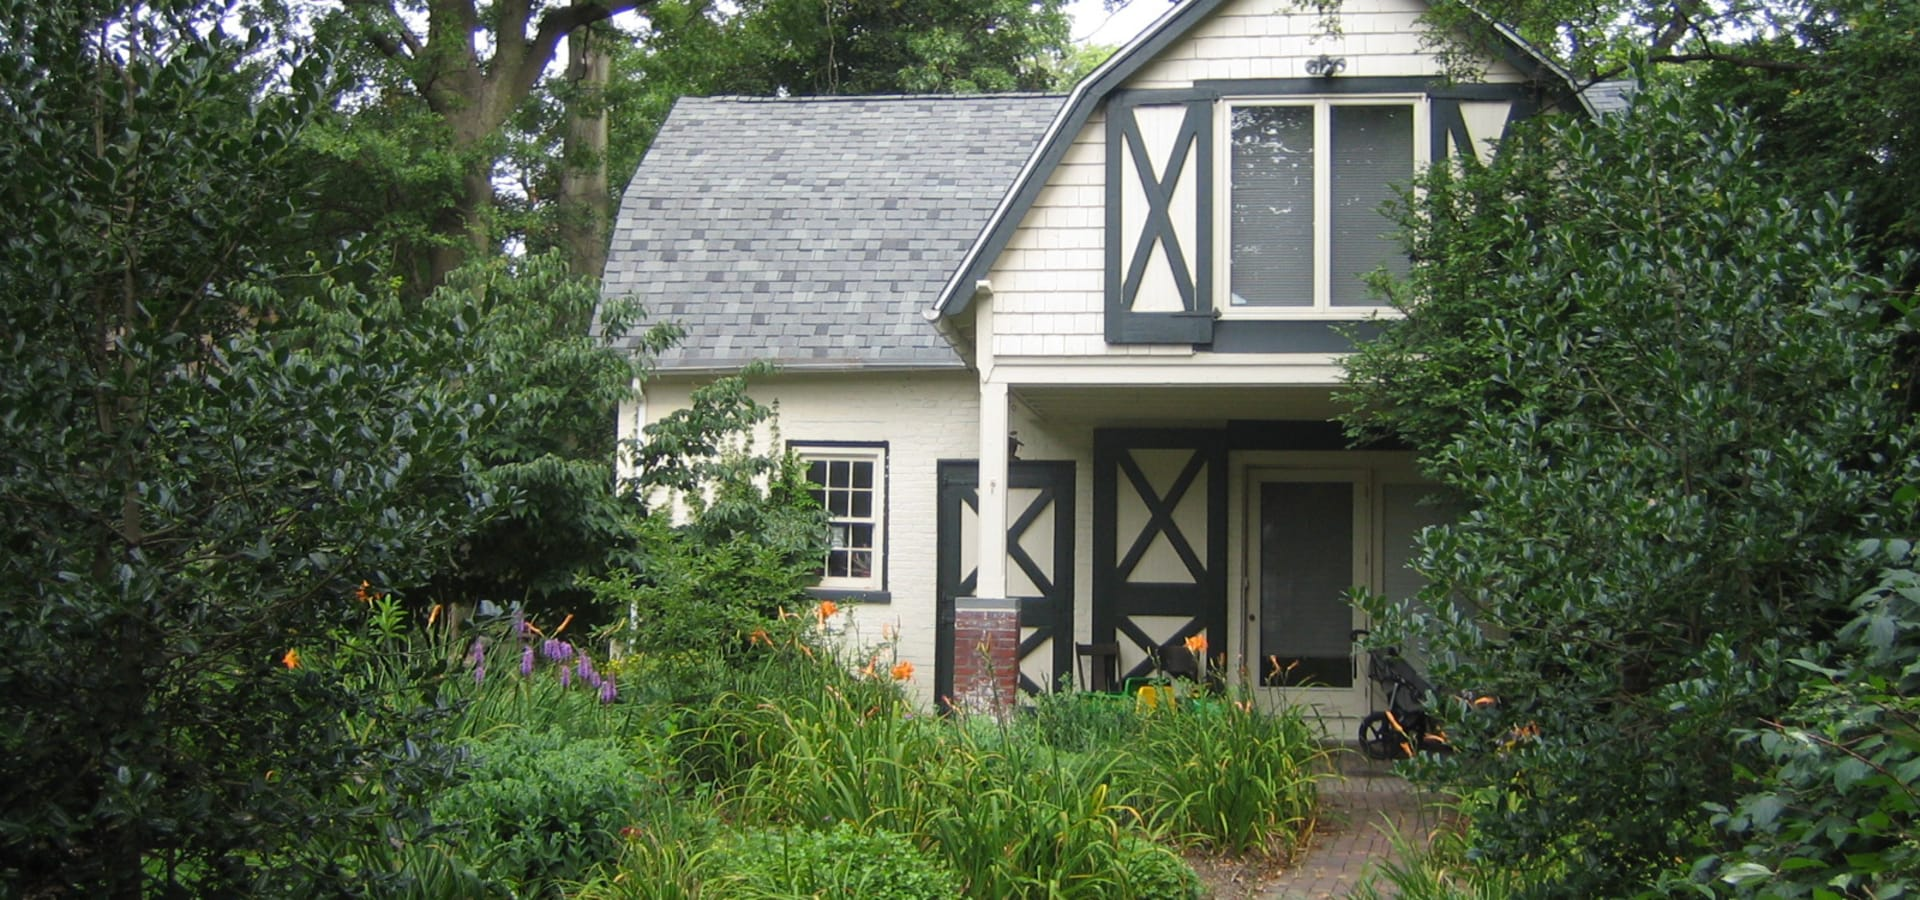 Metcalfe Architecture & Design